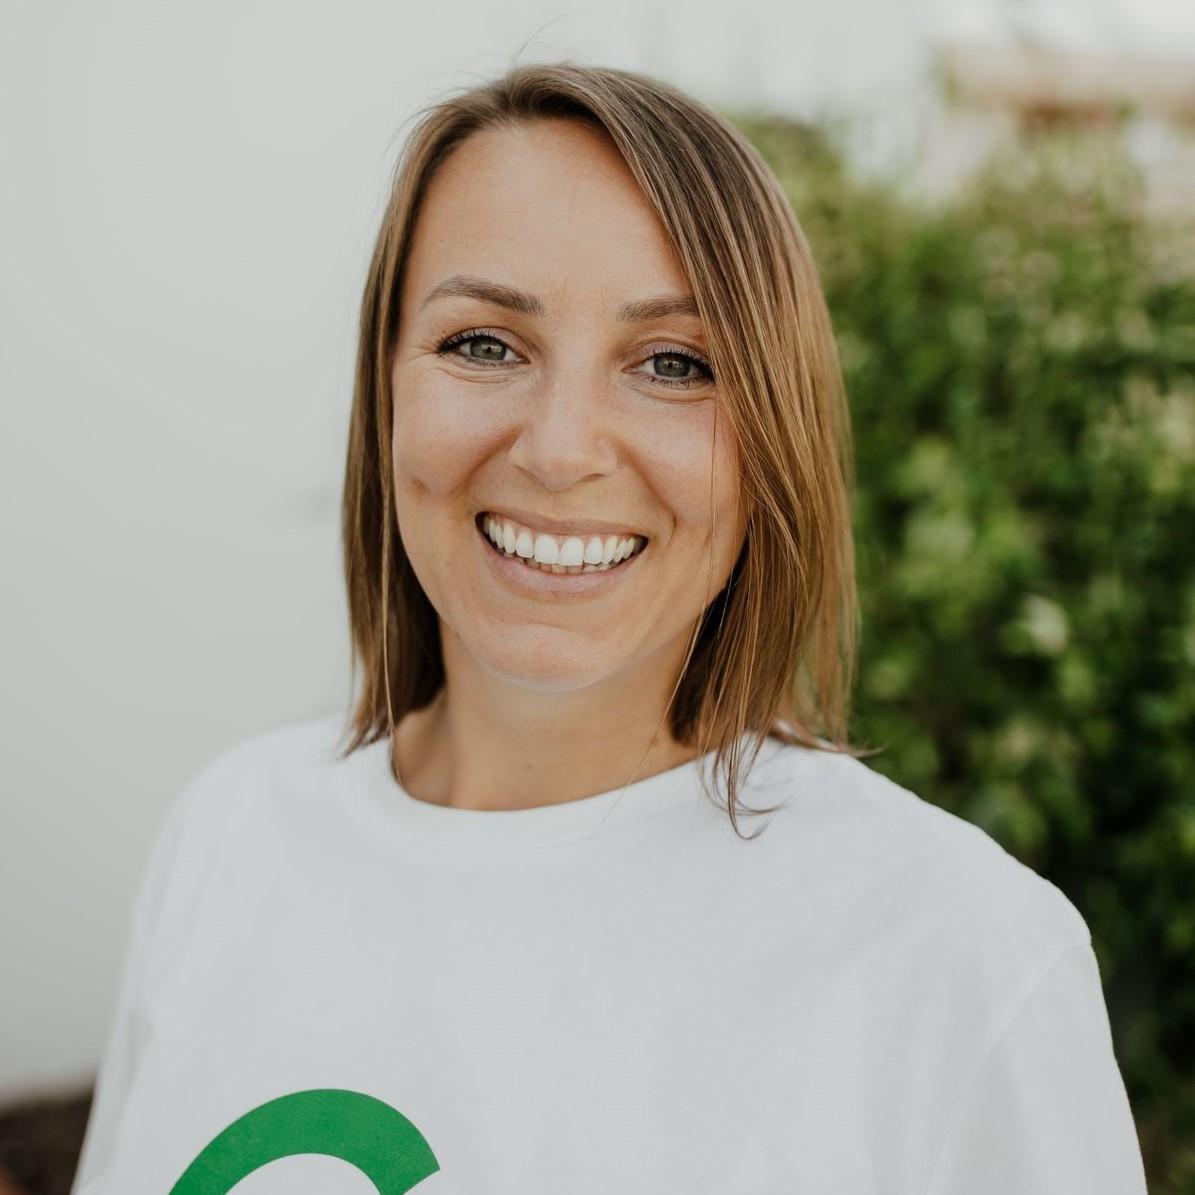 Andrea Endres Canary Green